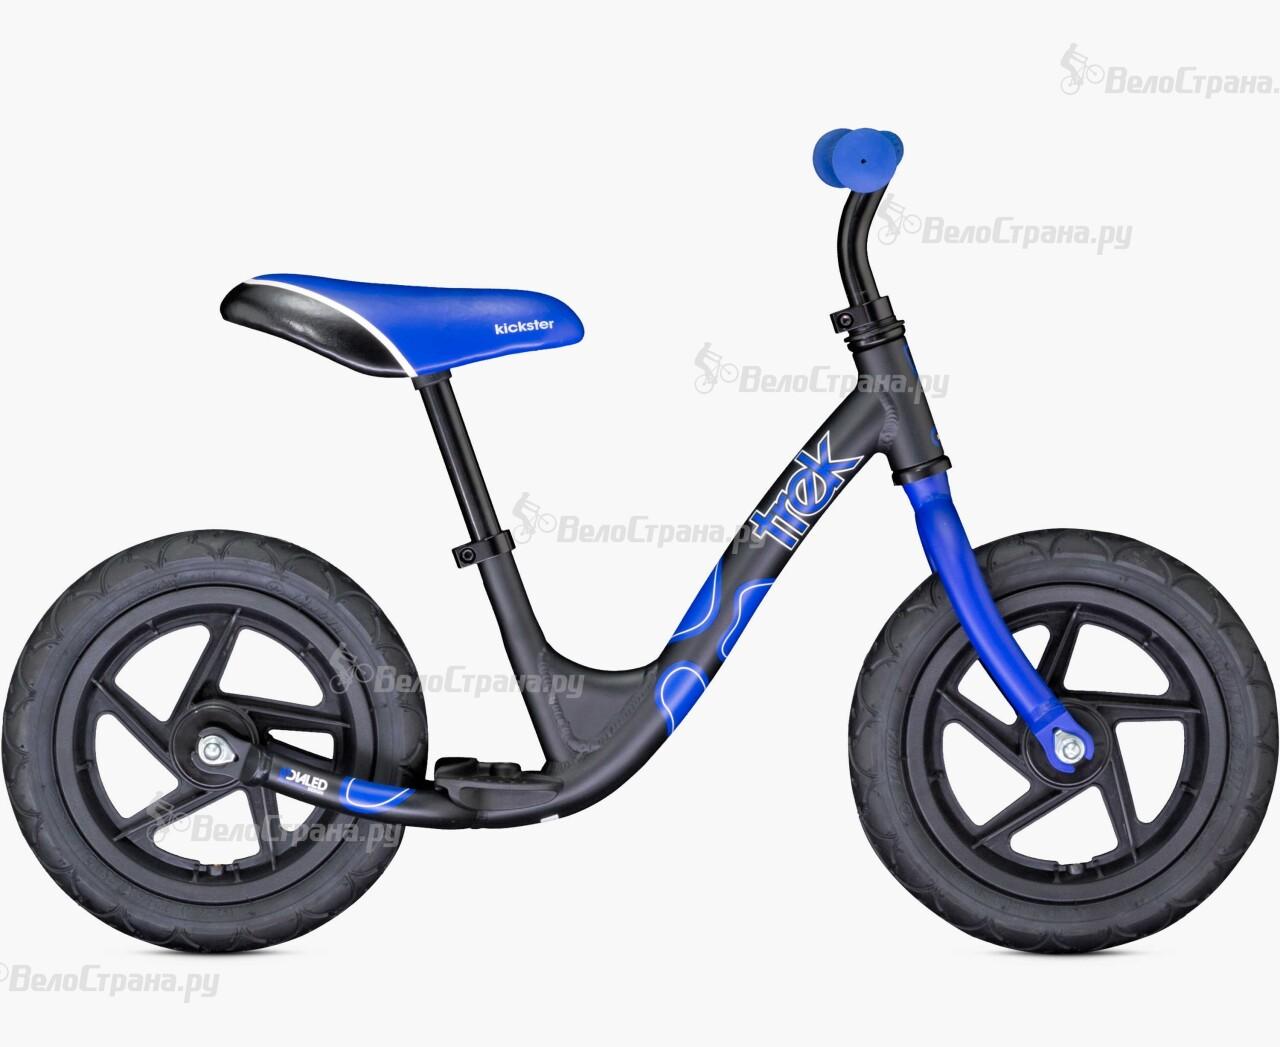 Велосипед Trek Kickster (2016)